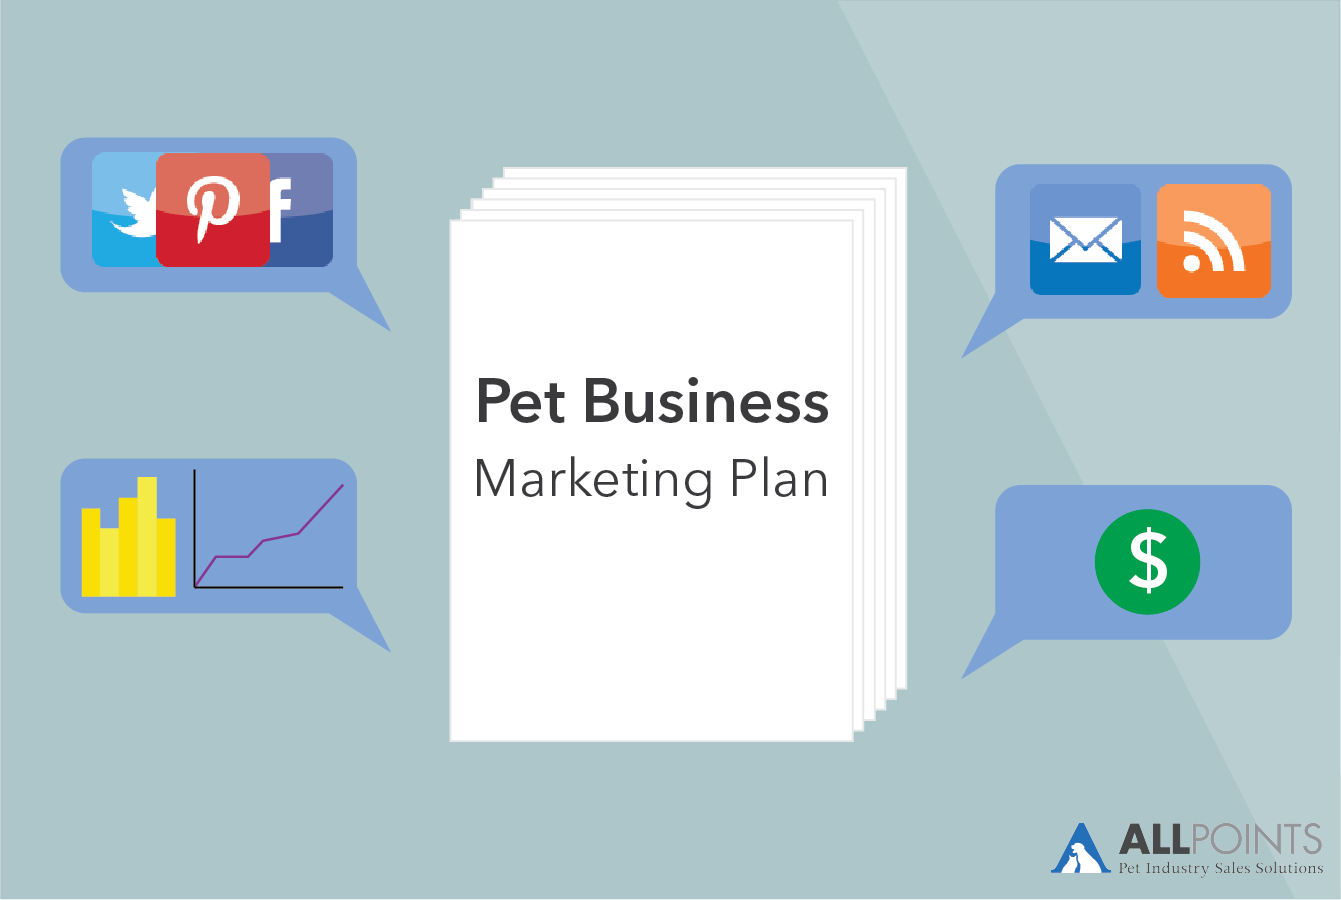 pet-business-marketing-guide-pet-product-marketing-plan